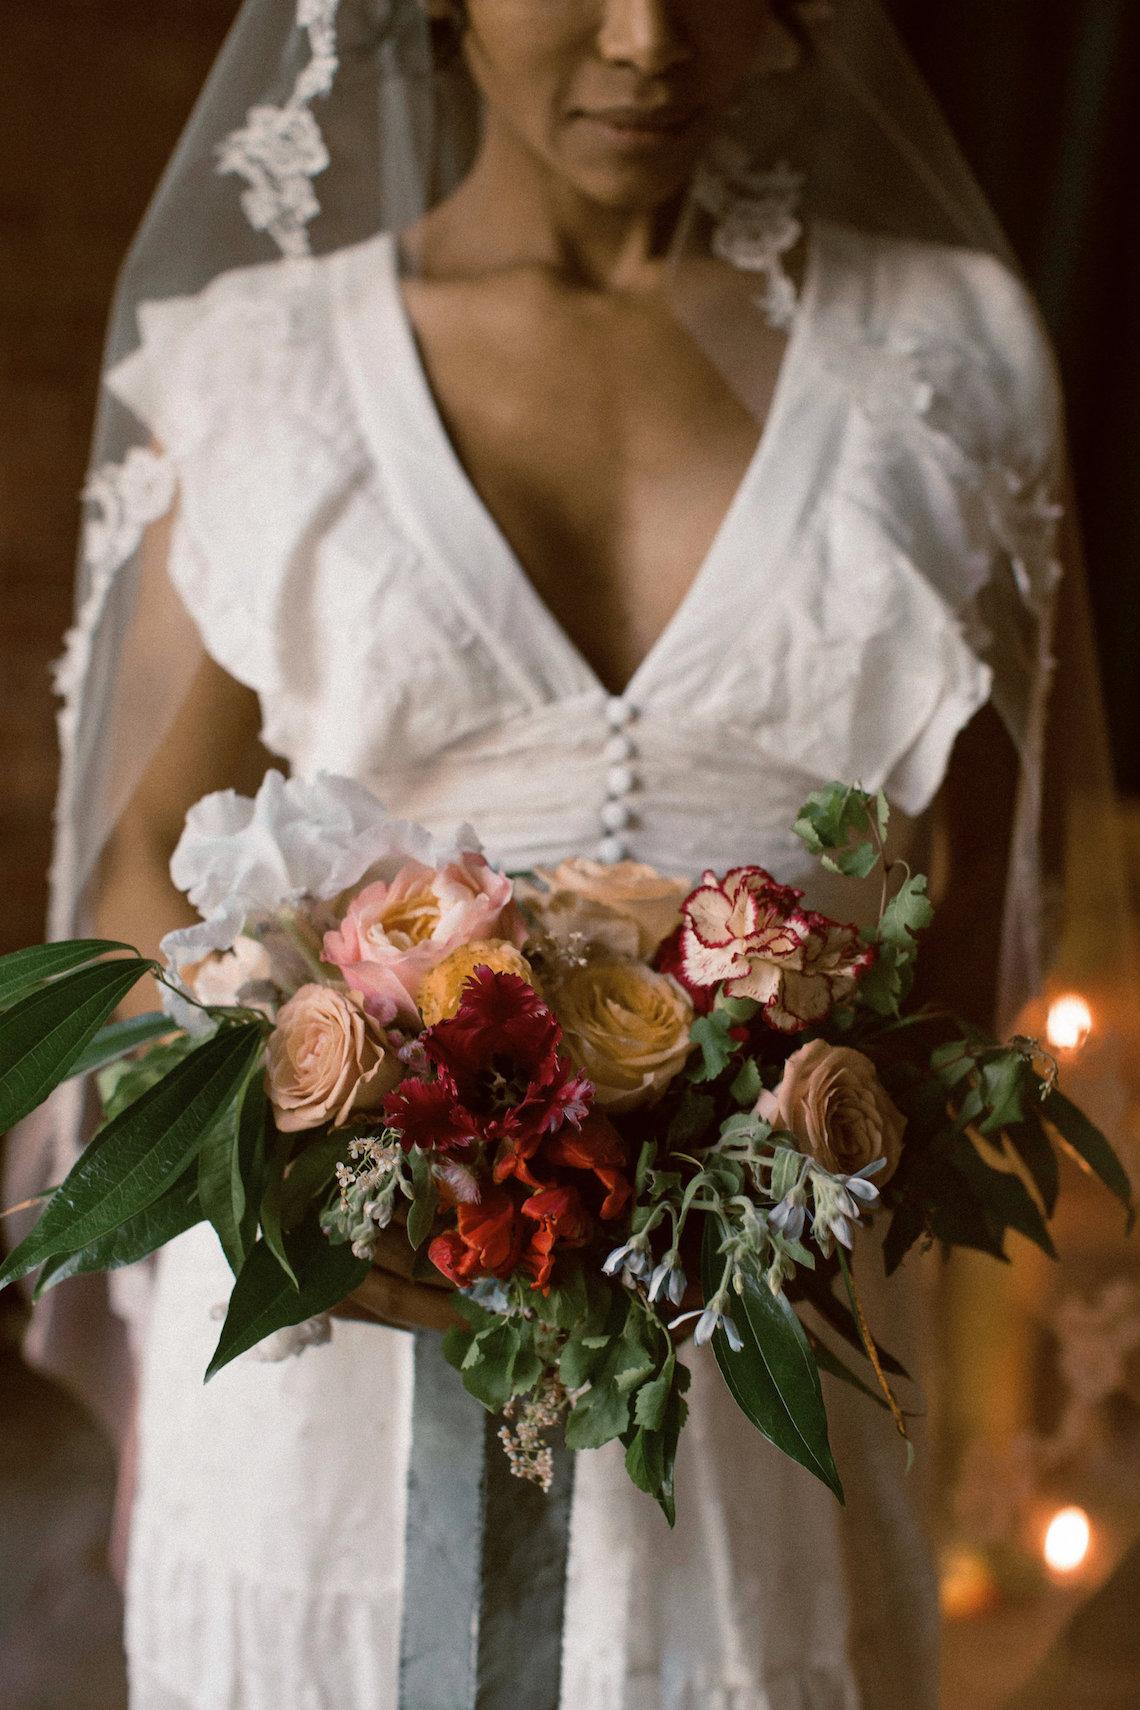 Romantic Candlelit Wedding Inspiration Full of Drama | Megan Wynn 33